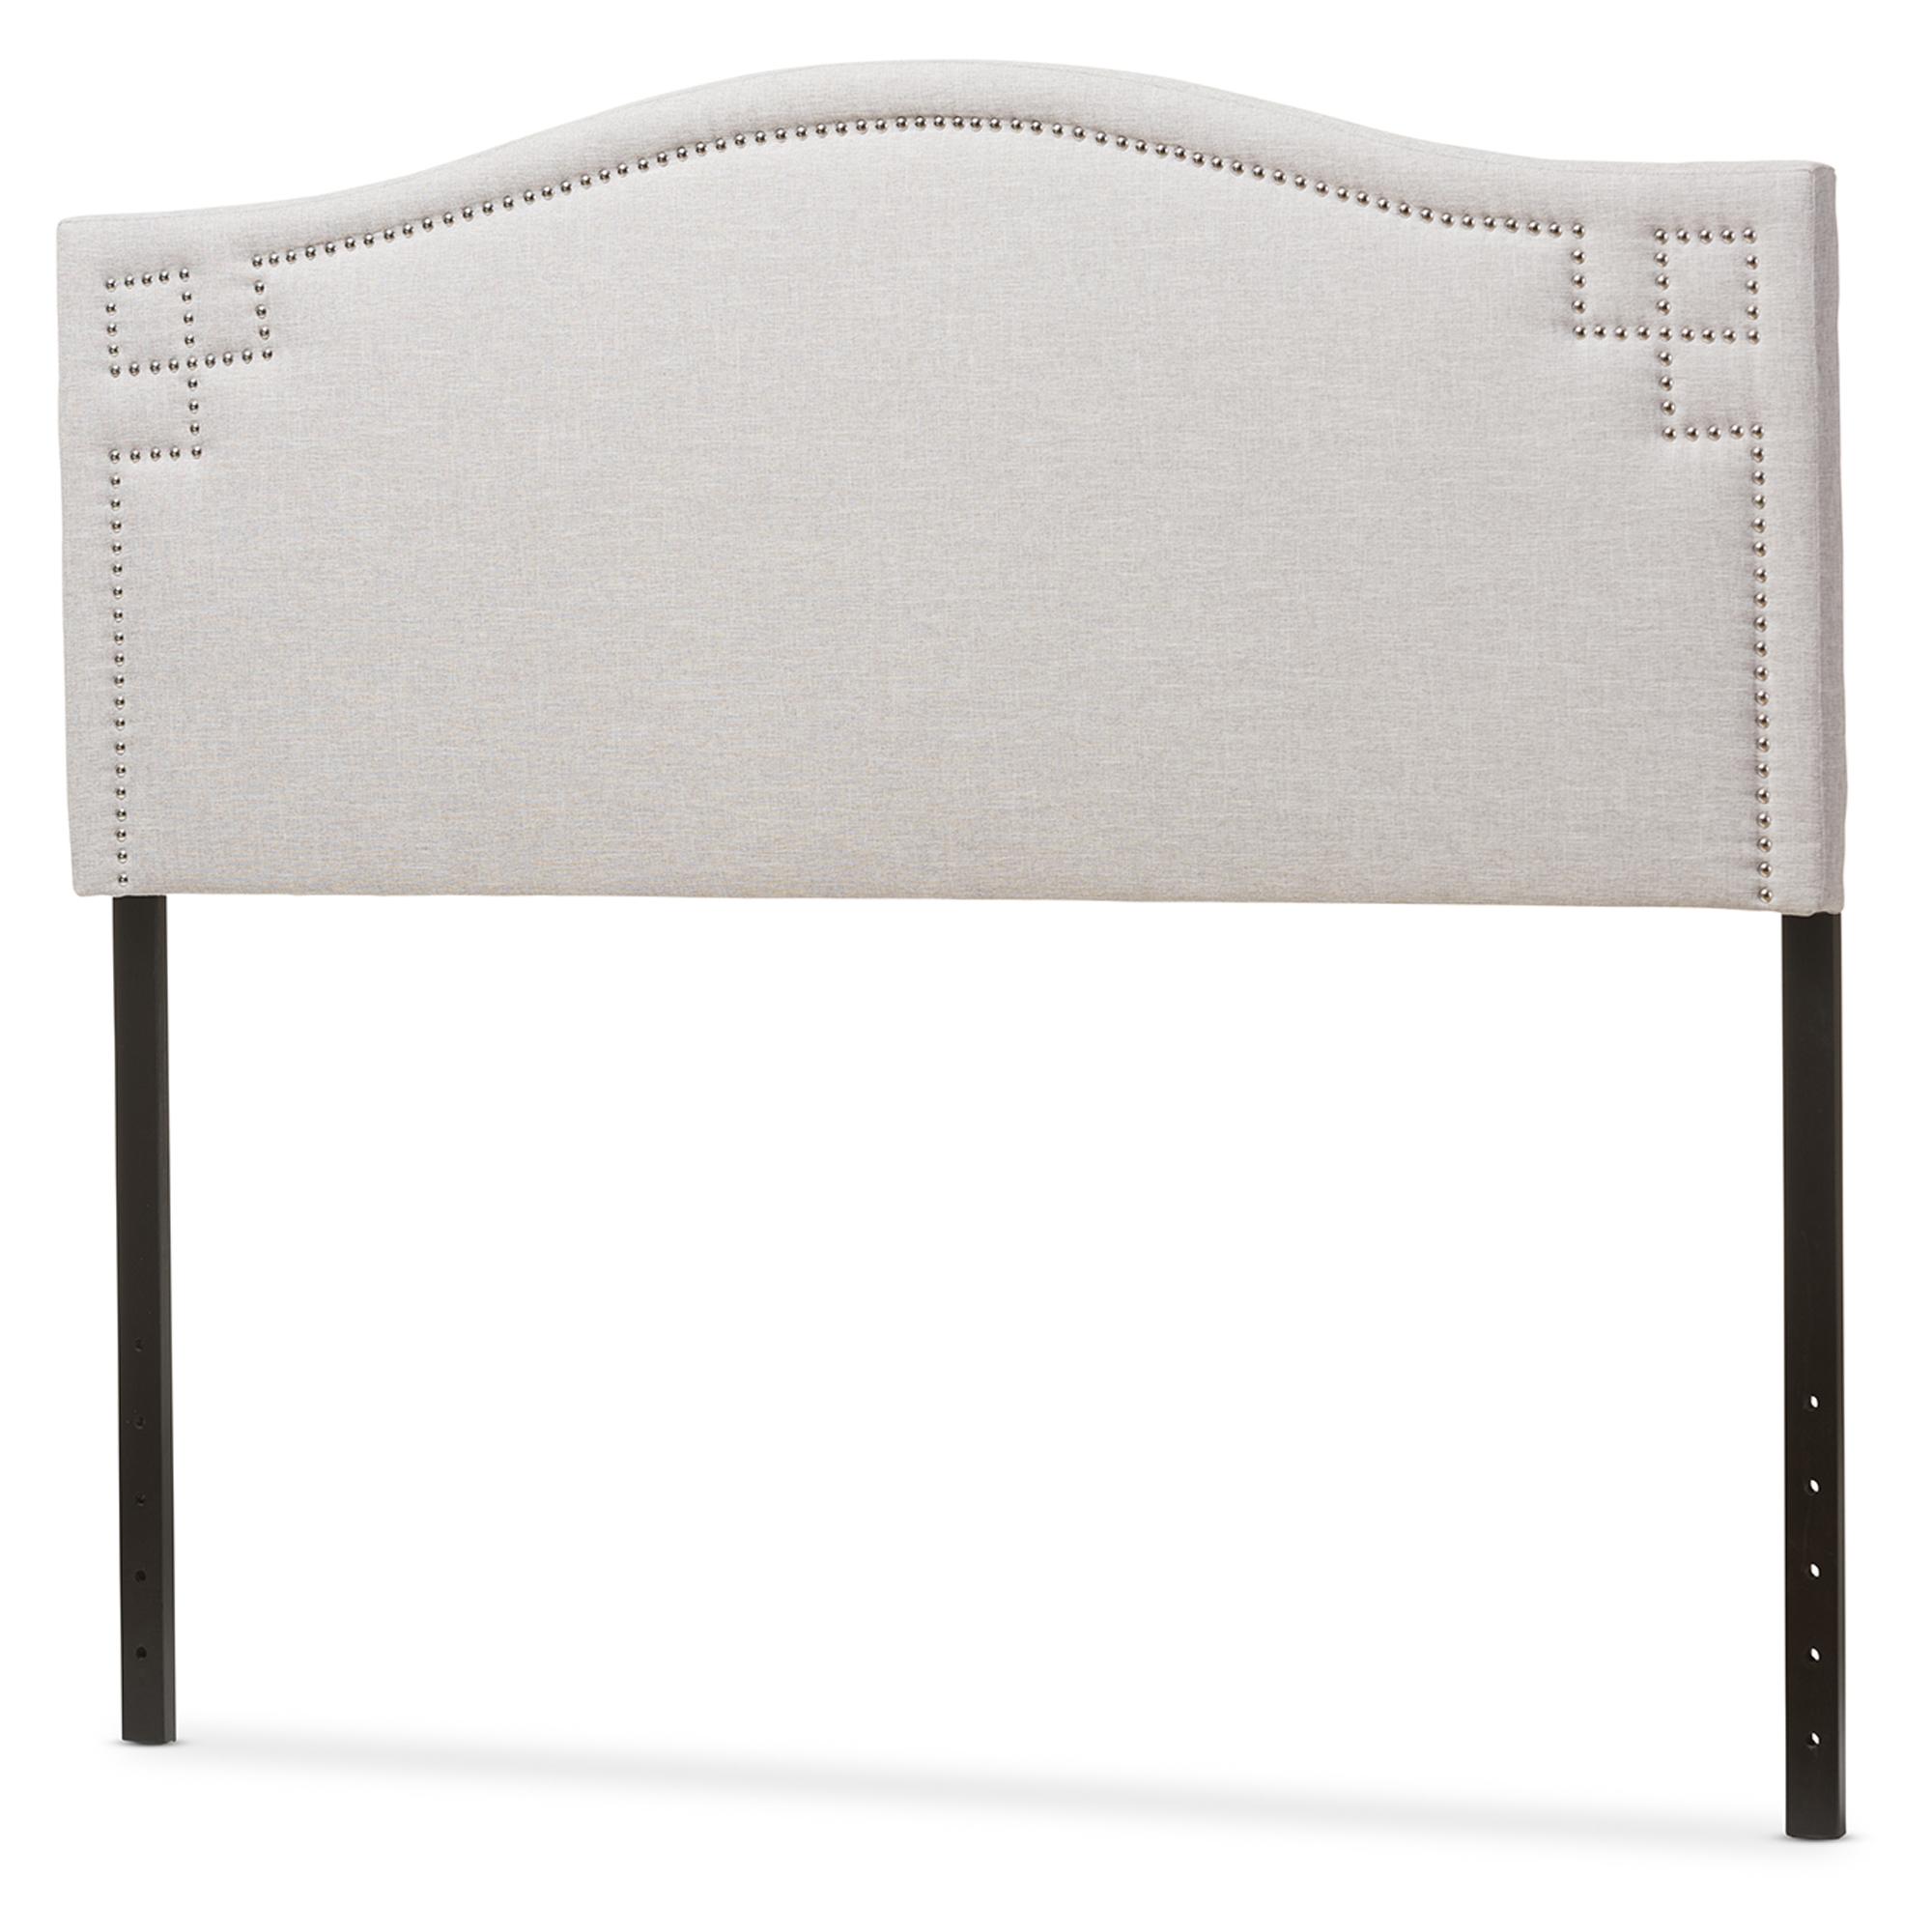 baxton studio aubrey modern and greyish beige fabric upholstered queen size headboard bsobbt6563